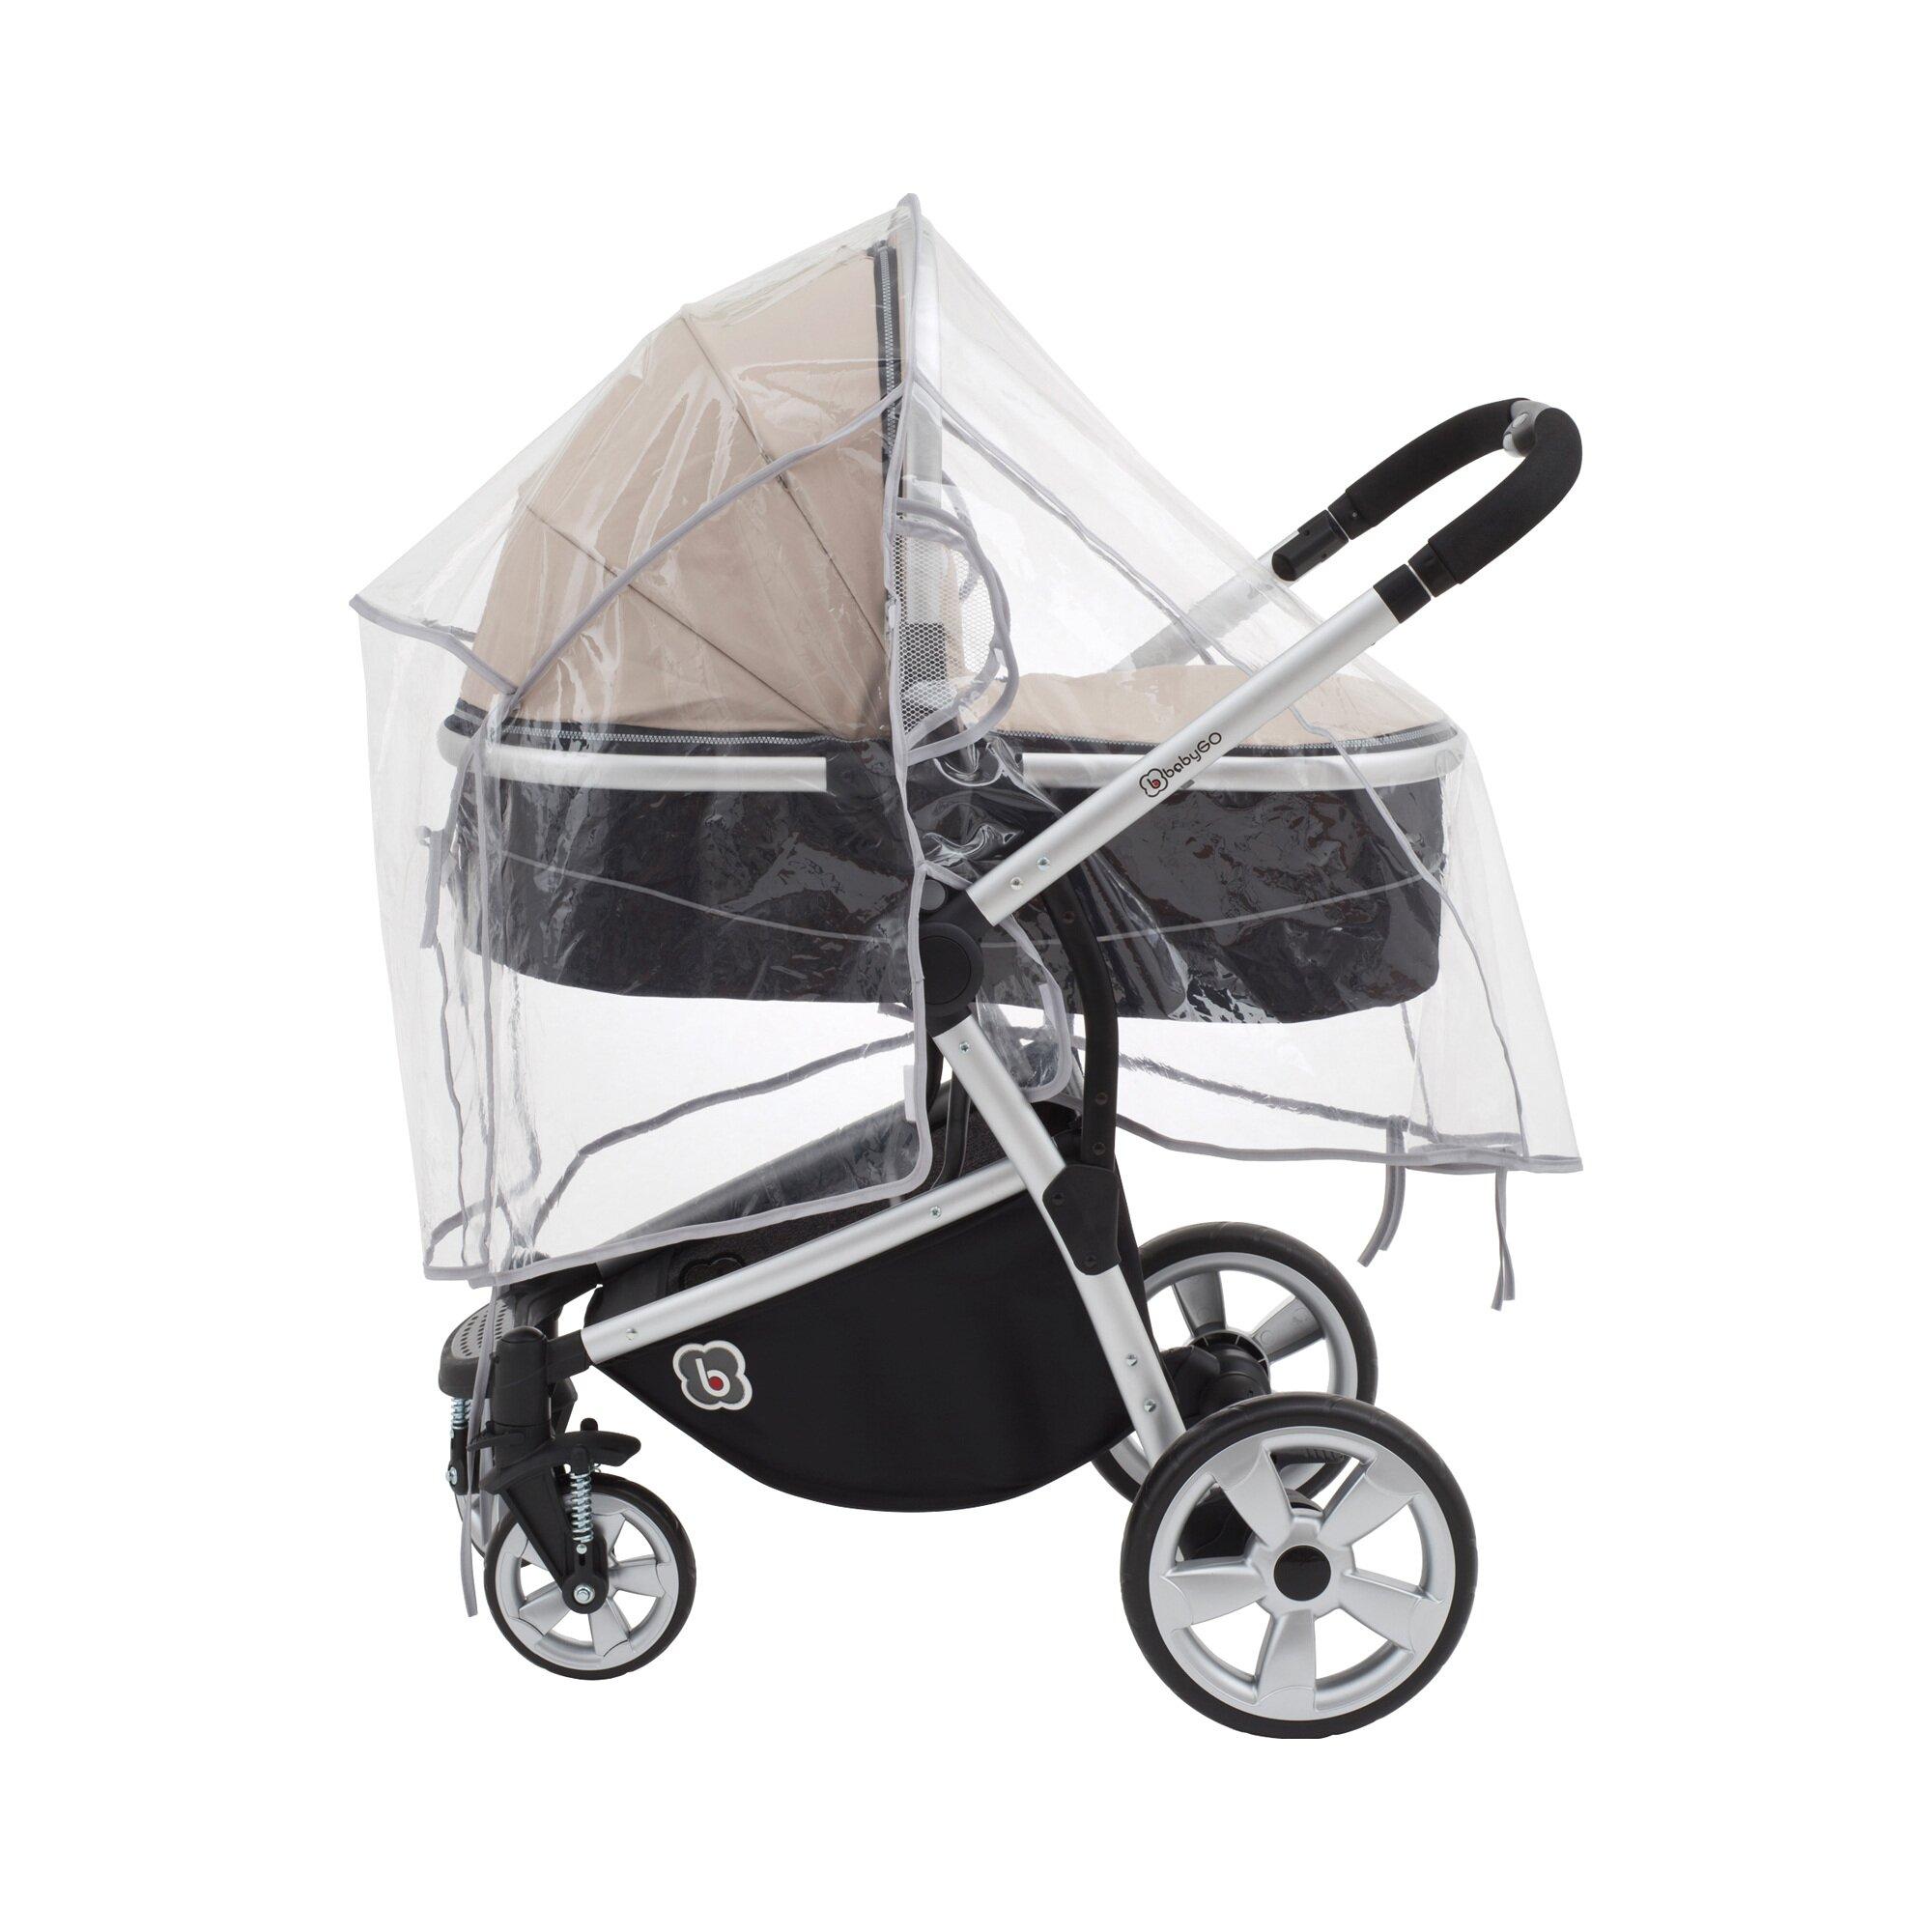 babygo-regenschutz-fur-kombikinderwagen-transparent